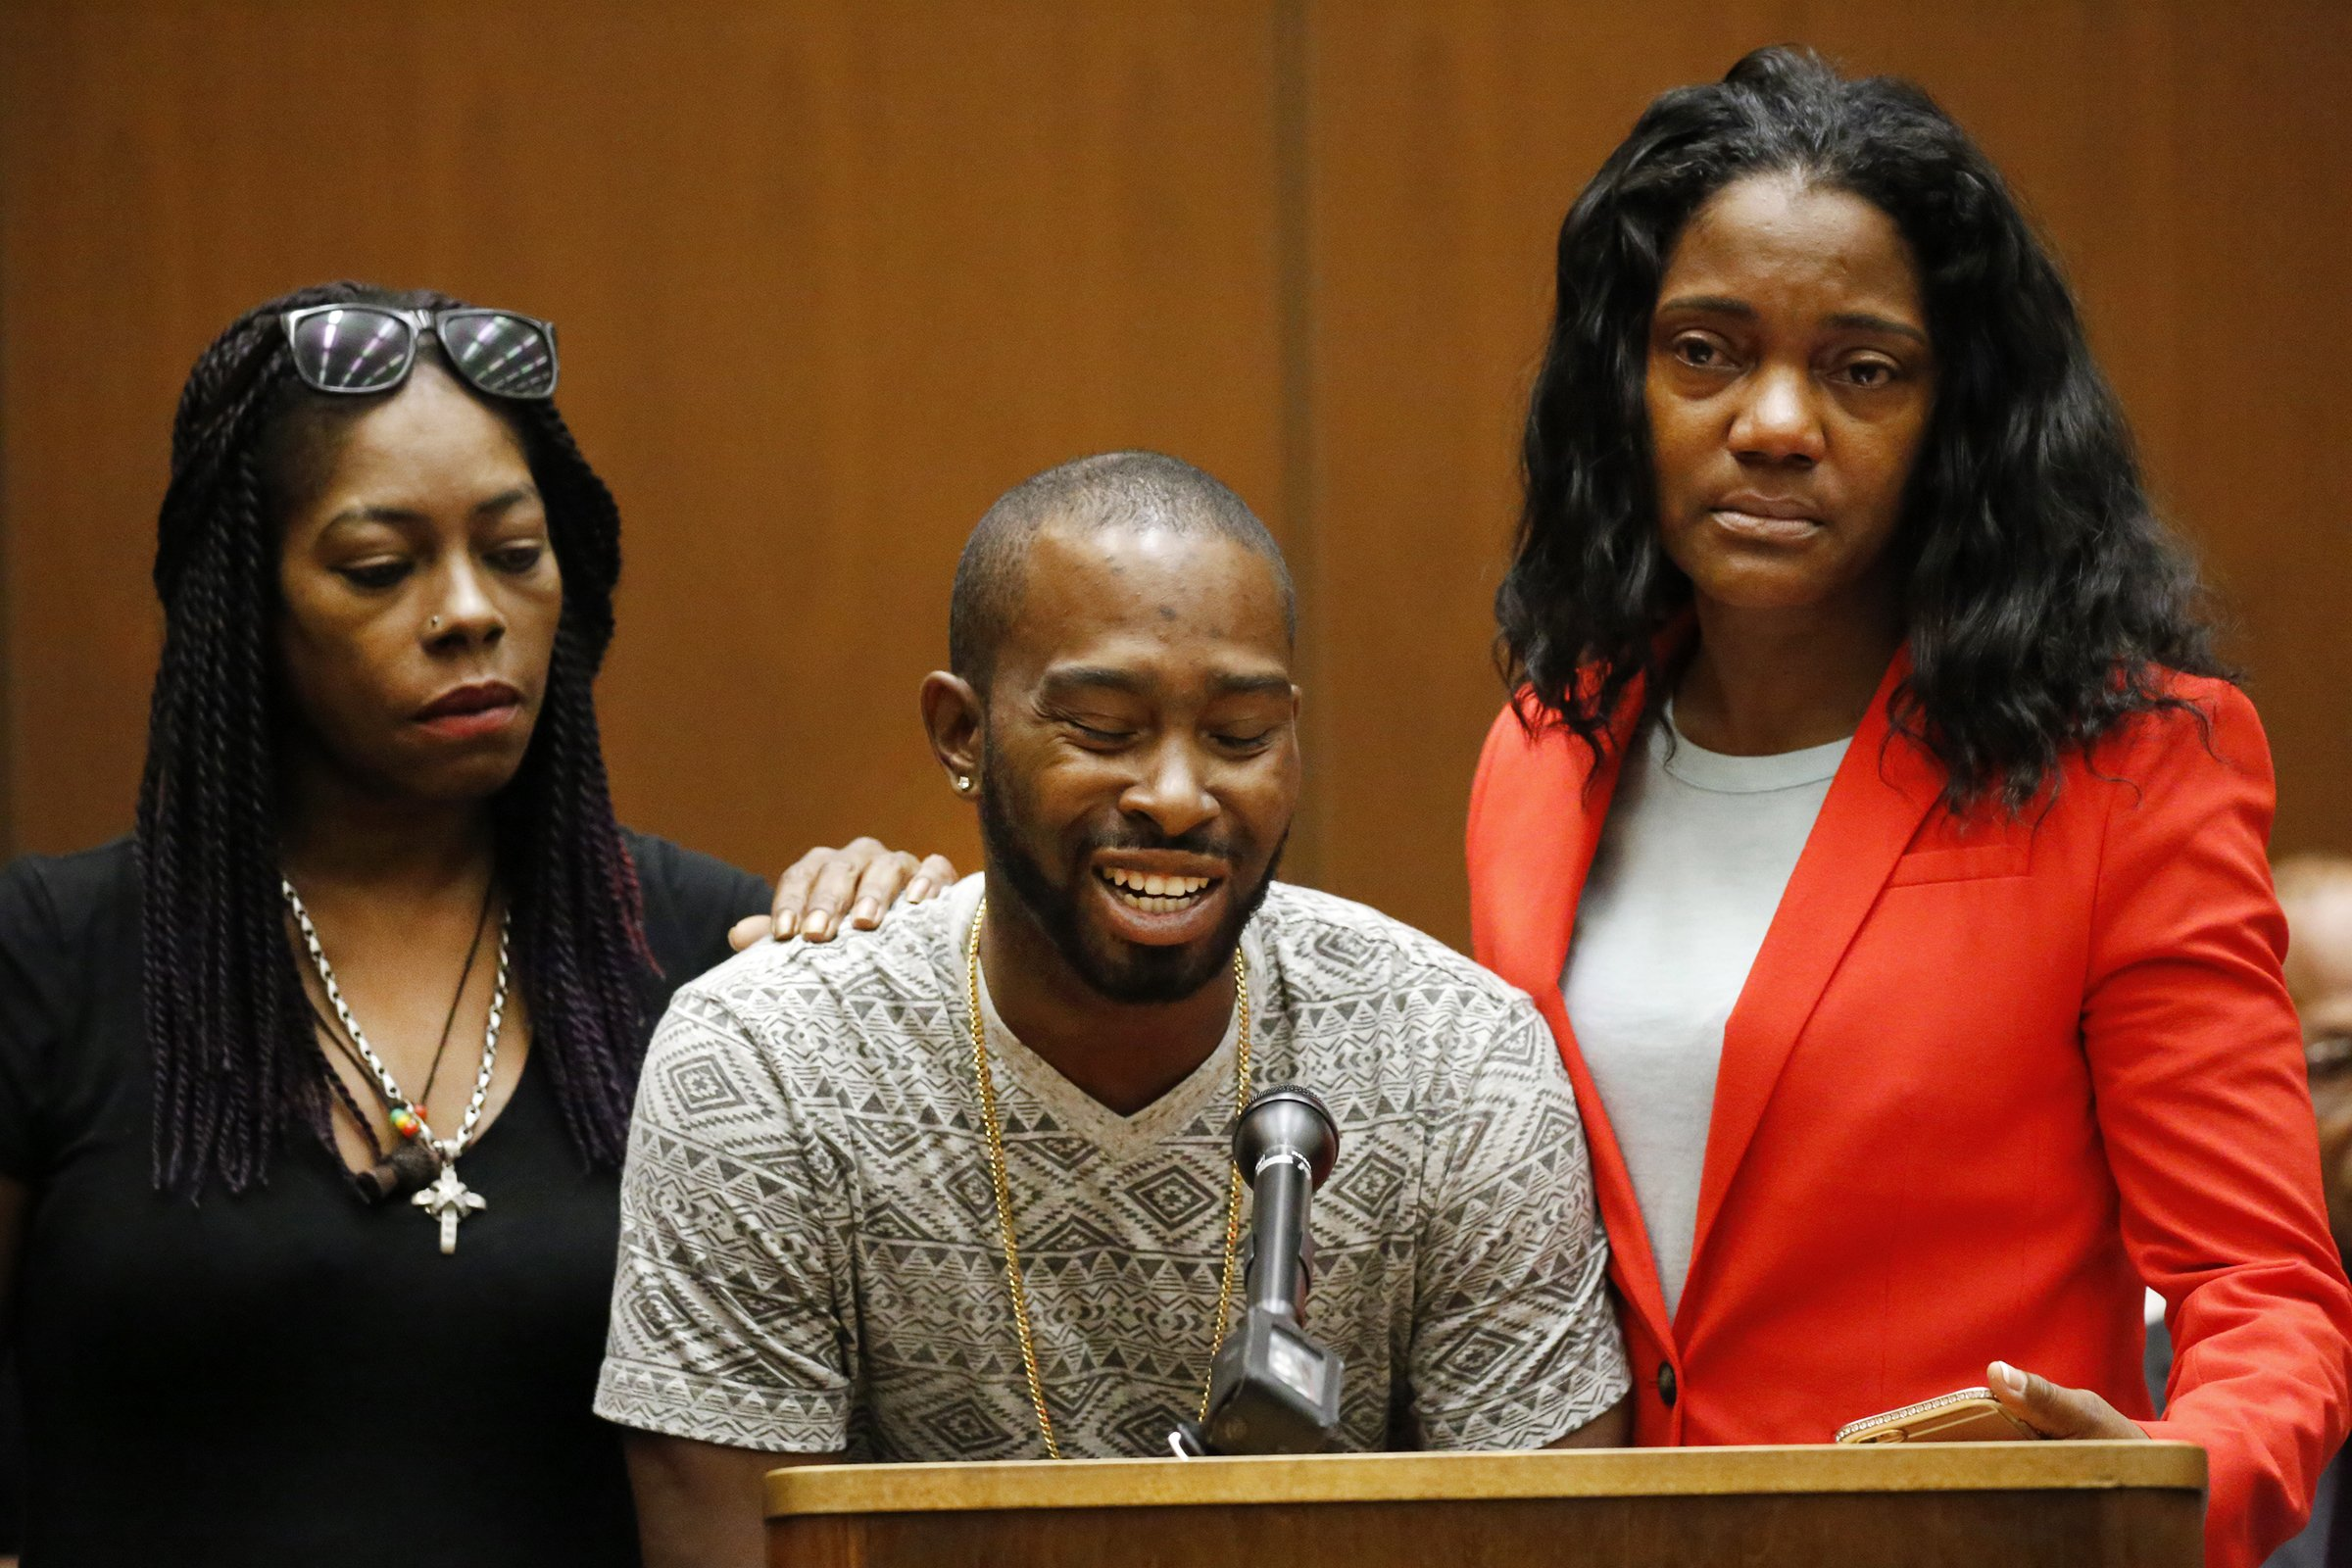 'Truly a piece of evil': 'Grim Sleeper' sent to death row